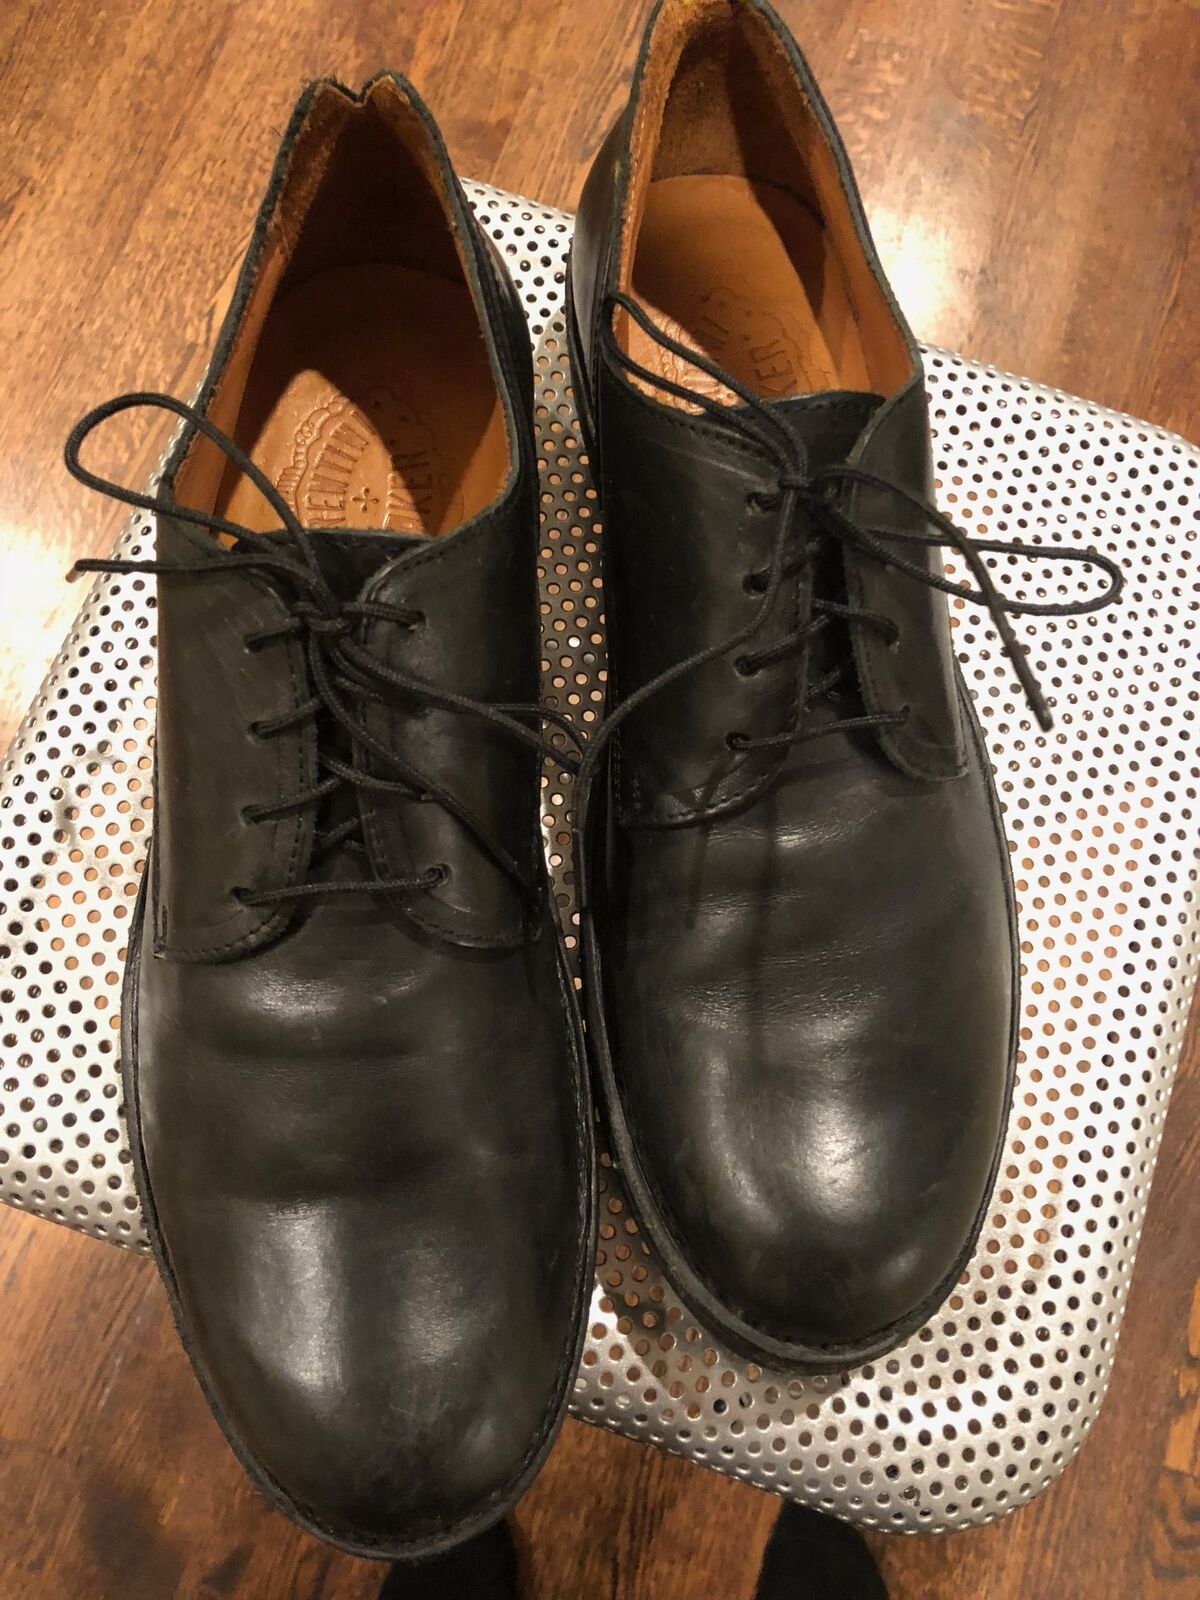 Excelente condición usada FIORENTI & BAKER Laceup Formal Vestido Negro Zapatos Hecho en Italia